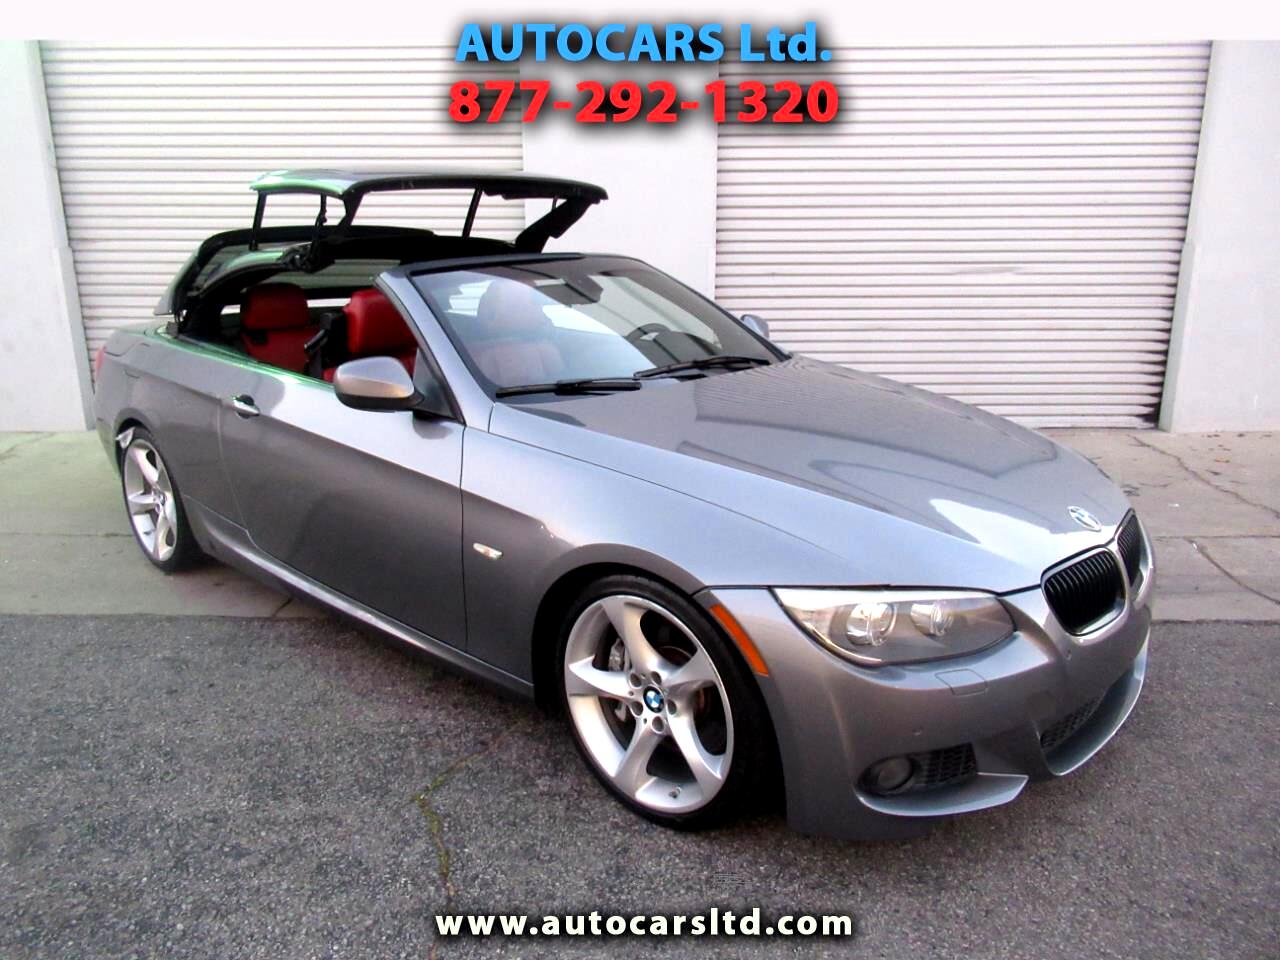 BMW 3 Series 2dr Conv 335i 2012